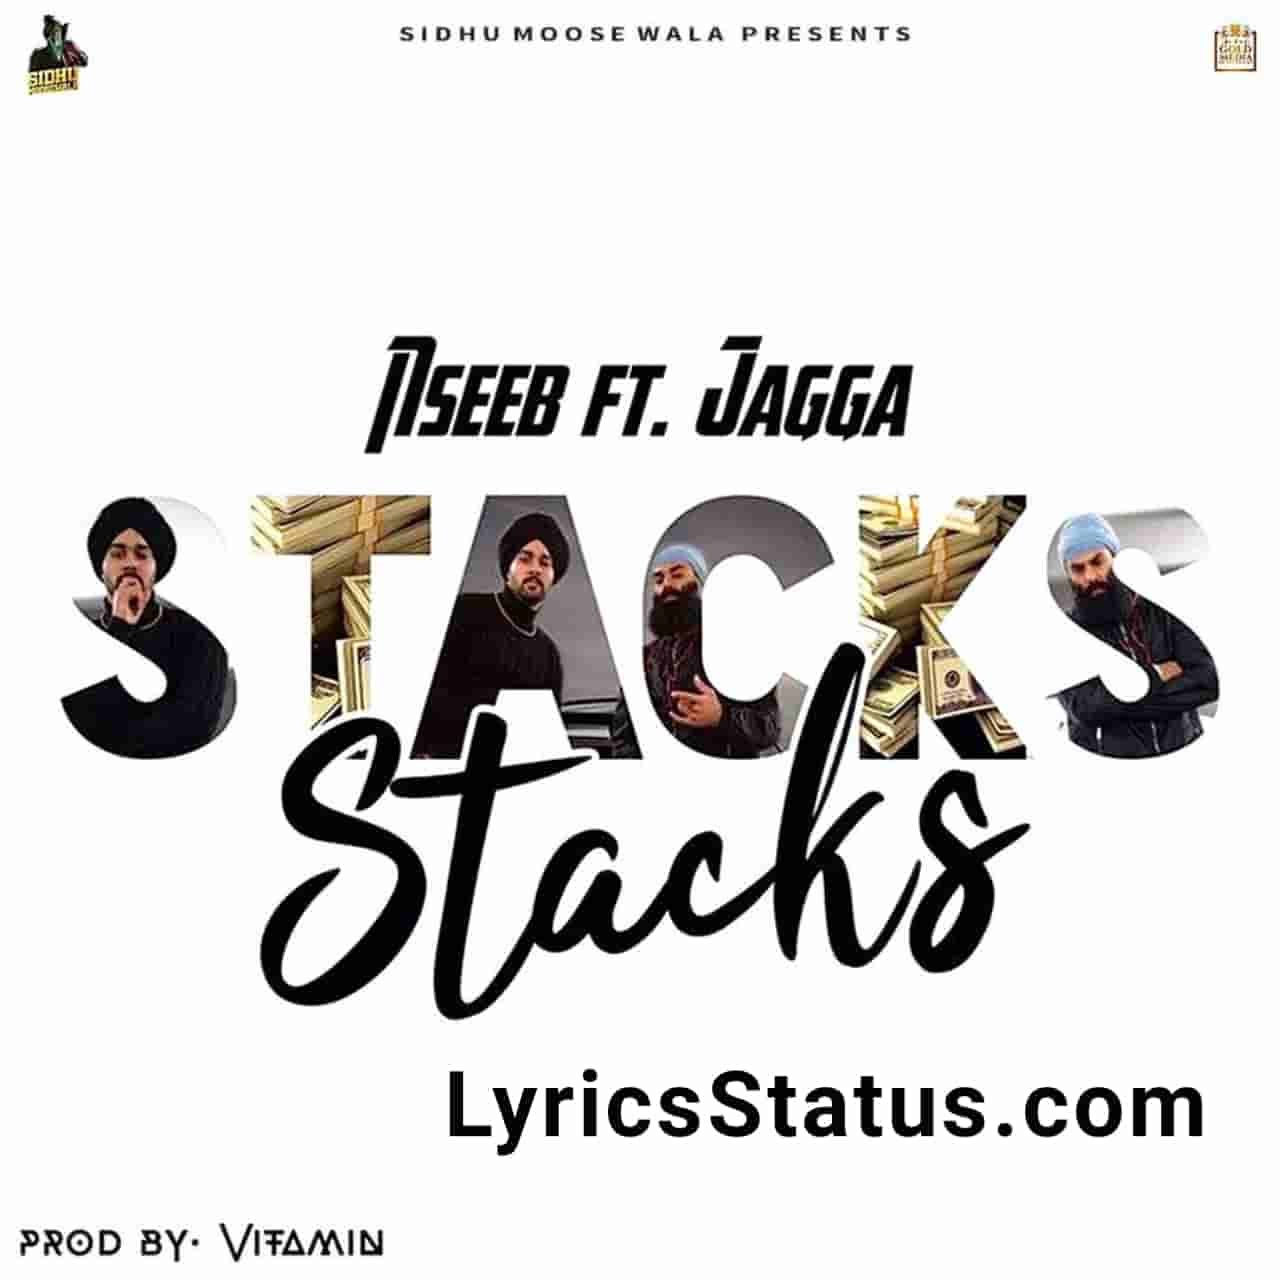 Nseeb Stacks Lyrics Status Download Jagga Sidhu Moose Wala Note Note Note Mainu Chahide Ne Note Naal Chahidi Ameeri, Naal Chahide Ne Lok